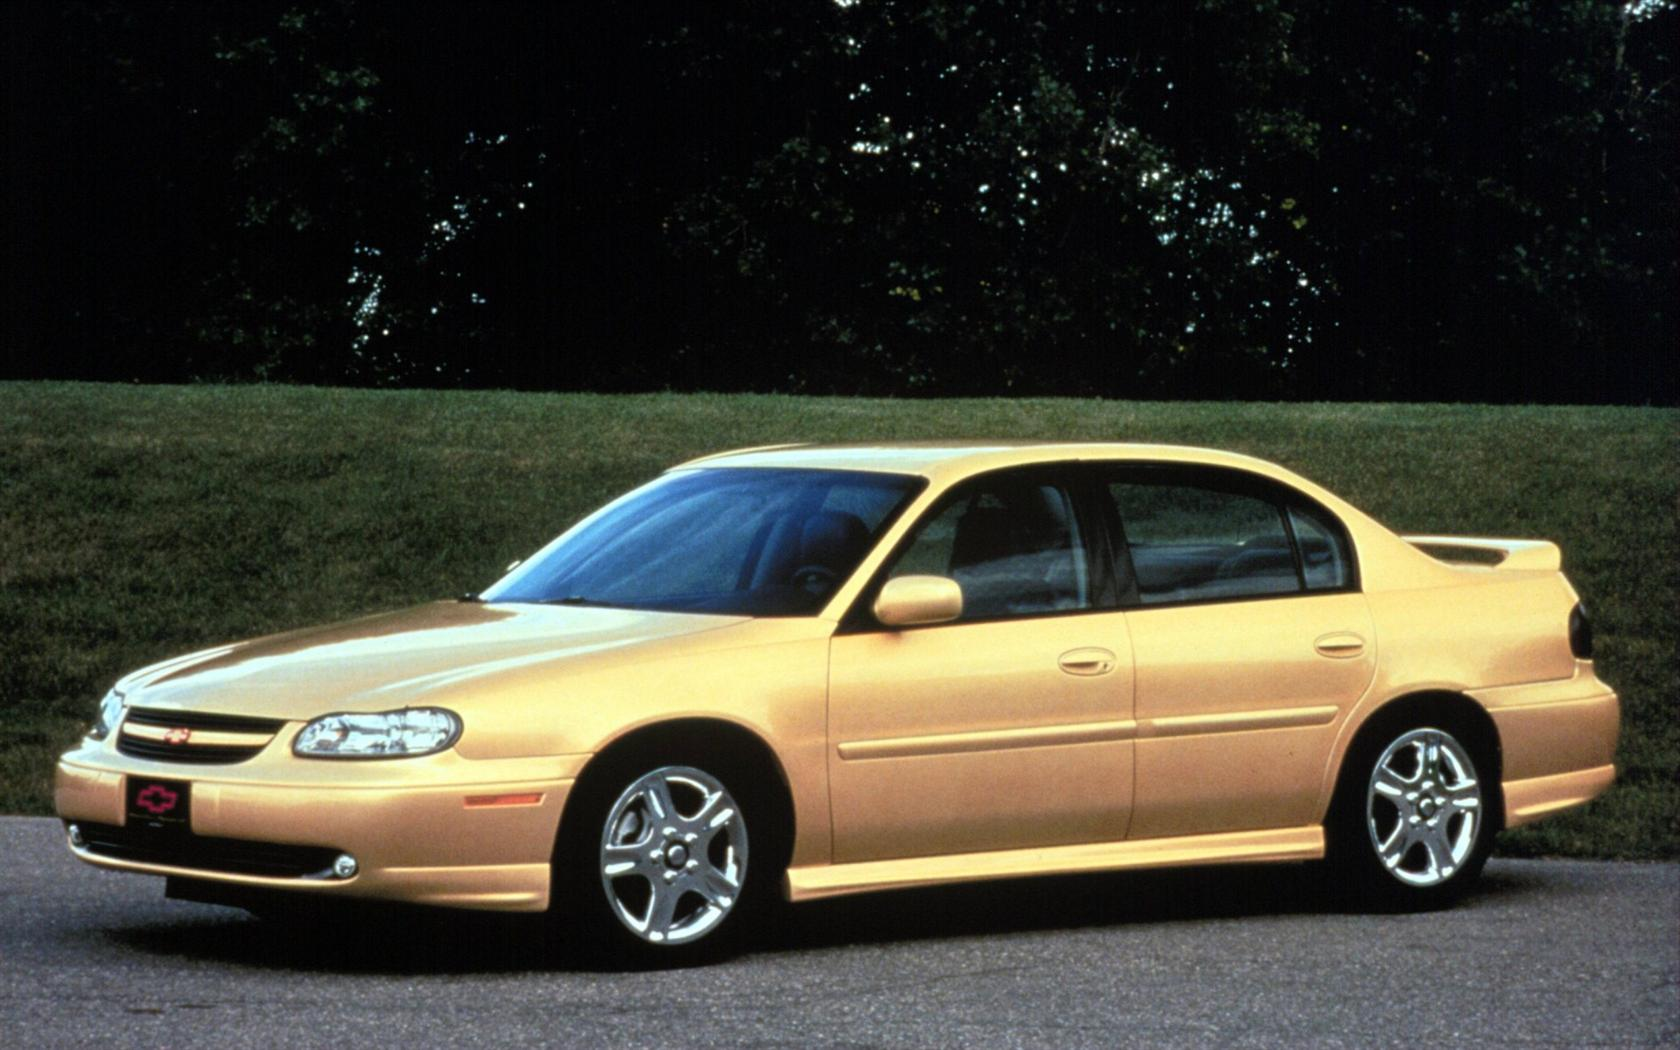 Cavalier chevy cavalier 99 : 1999 Chevrolet Malibu Image. https://www.conceptcarz.com/images ...